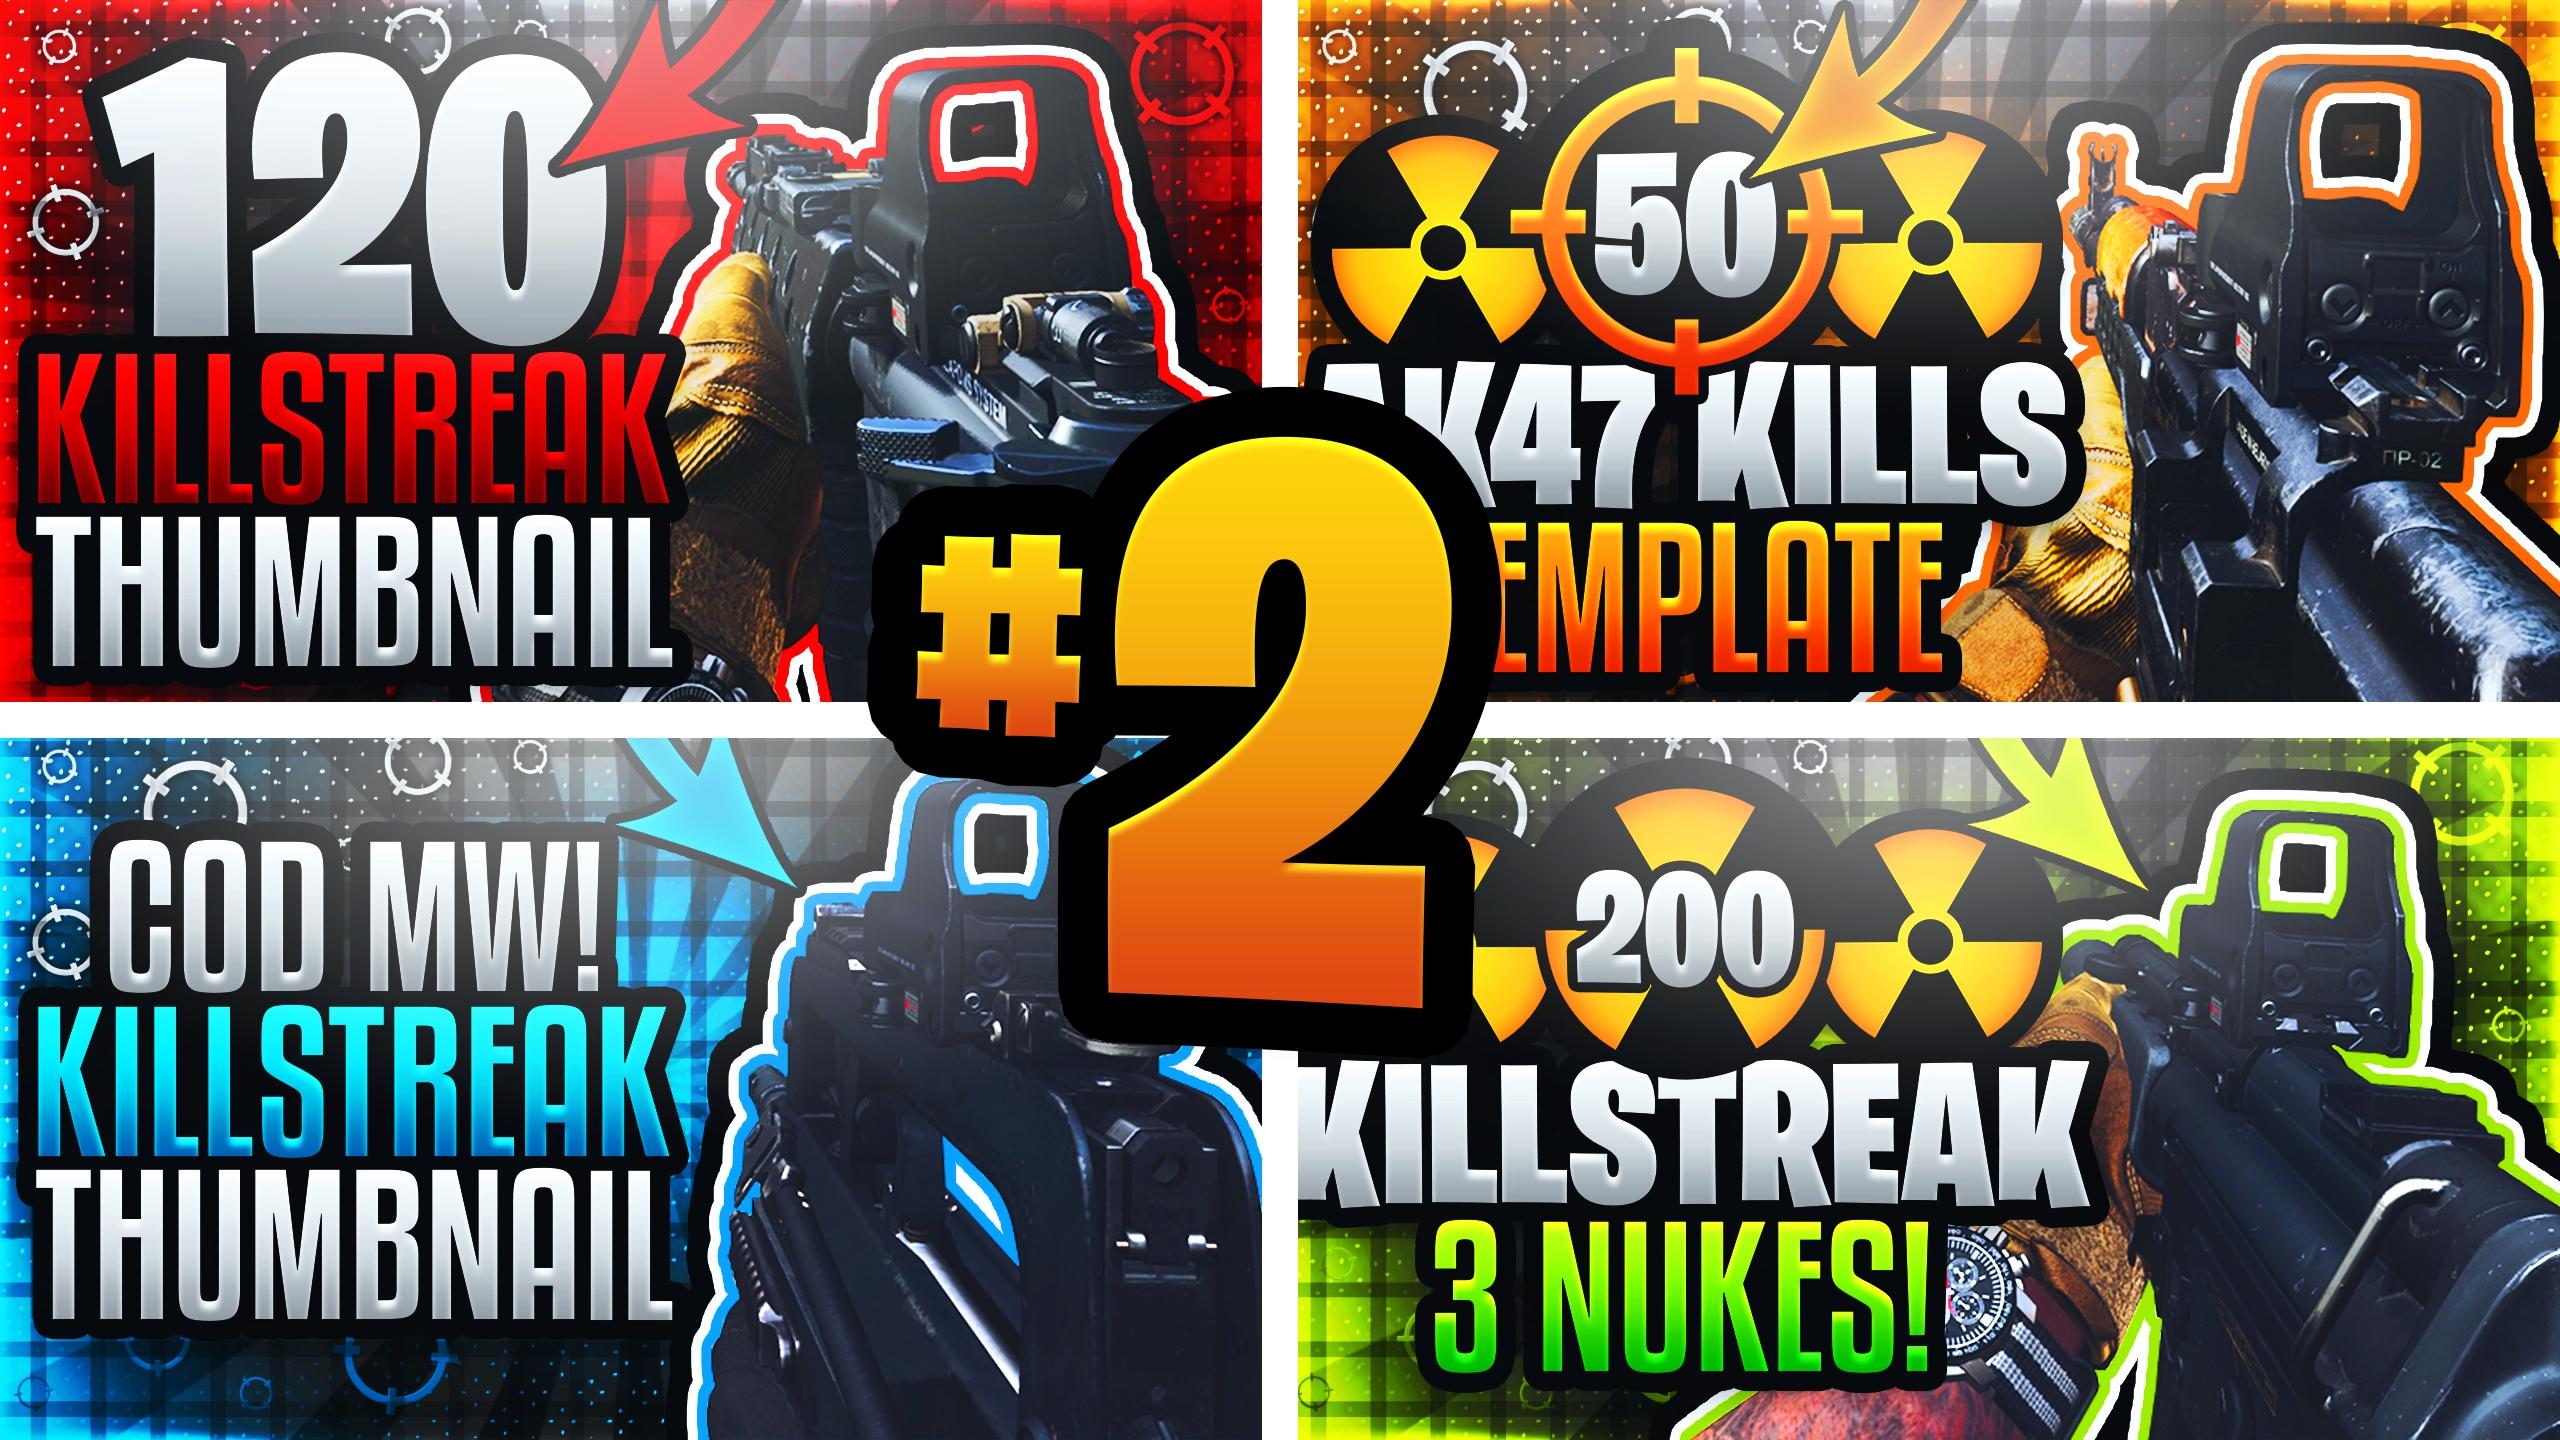 Modern Warfare Youtube Thumbnail Template Pack 2 Pu Acez Graphics Templates